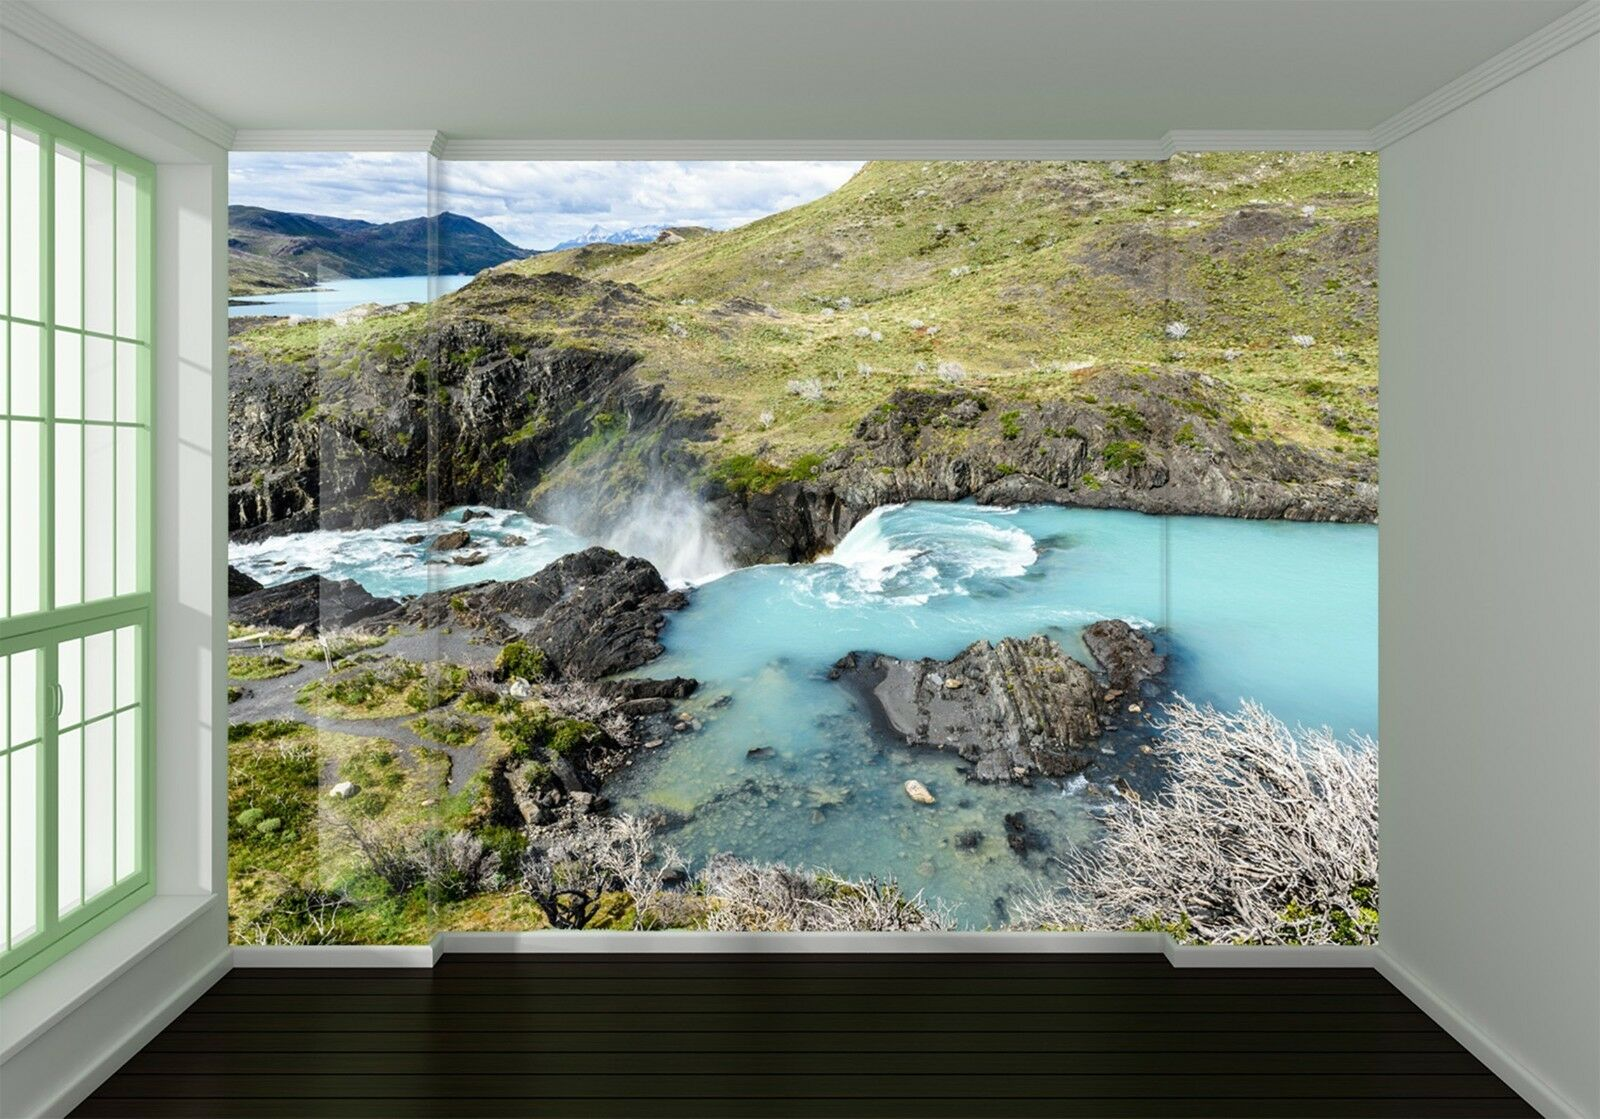 3D Turbulente Wiese 8788 Tapete Wandgemälde Tapeten Bild Familie DE Lemon  | Große Klassifizierung  | Qualität zuerst  | Online-Shop